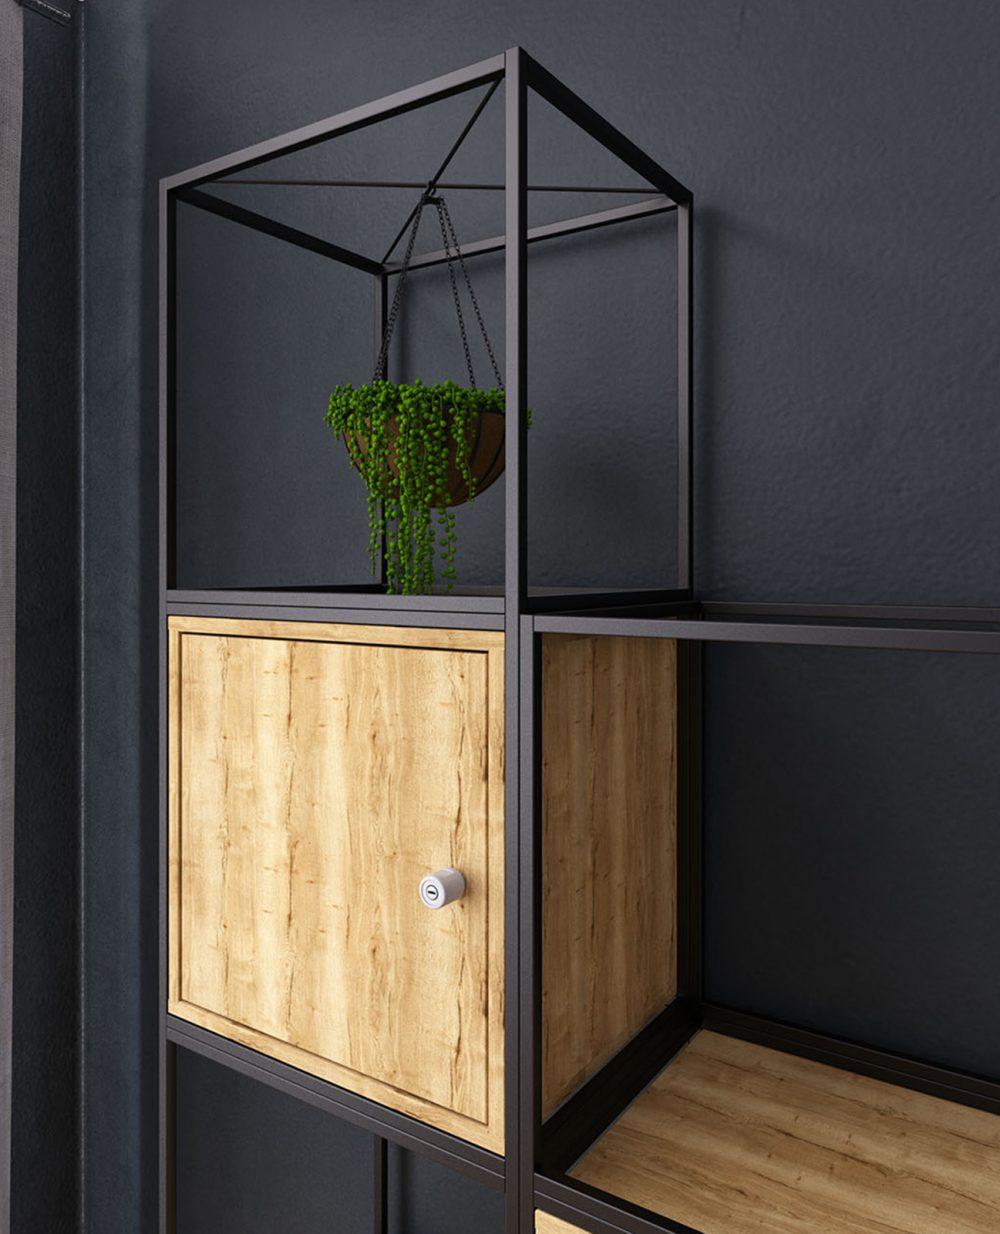 halifax oak, locker, storage, pull handle, plant hanger, black metalwork